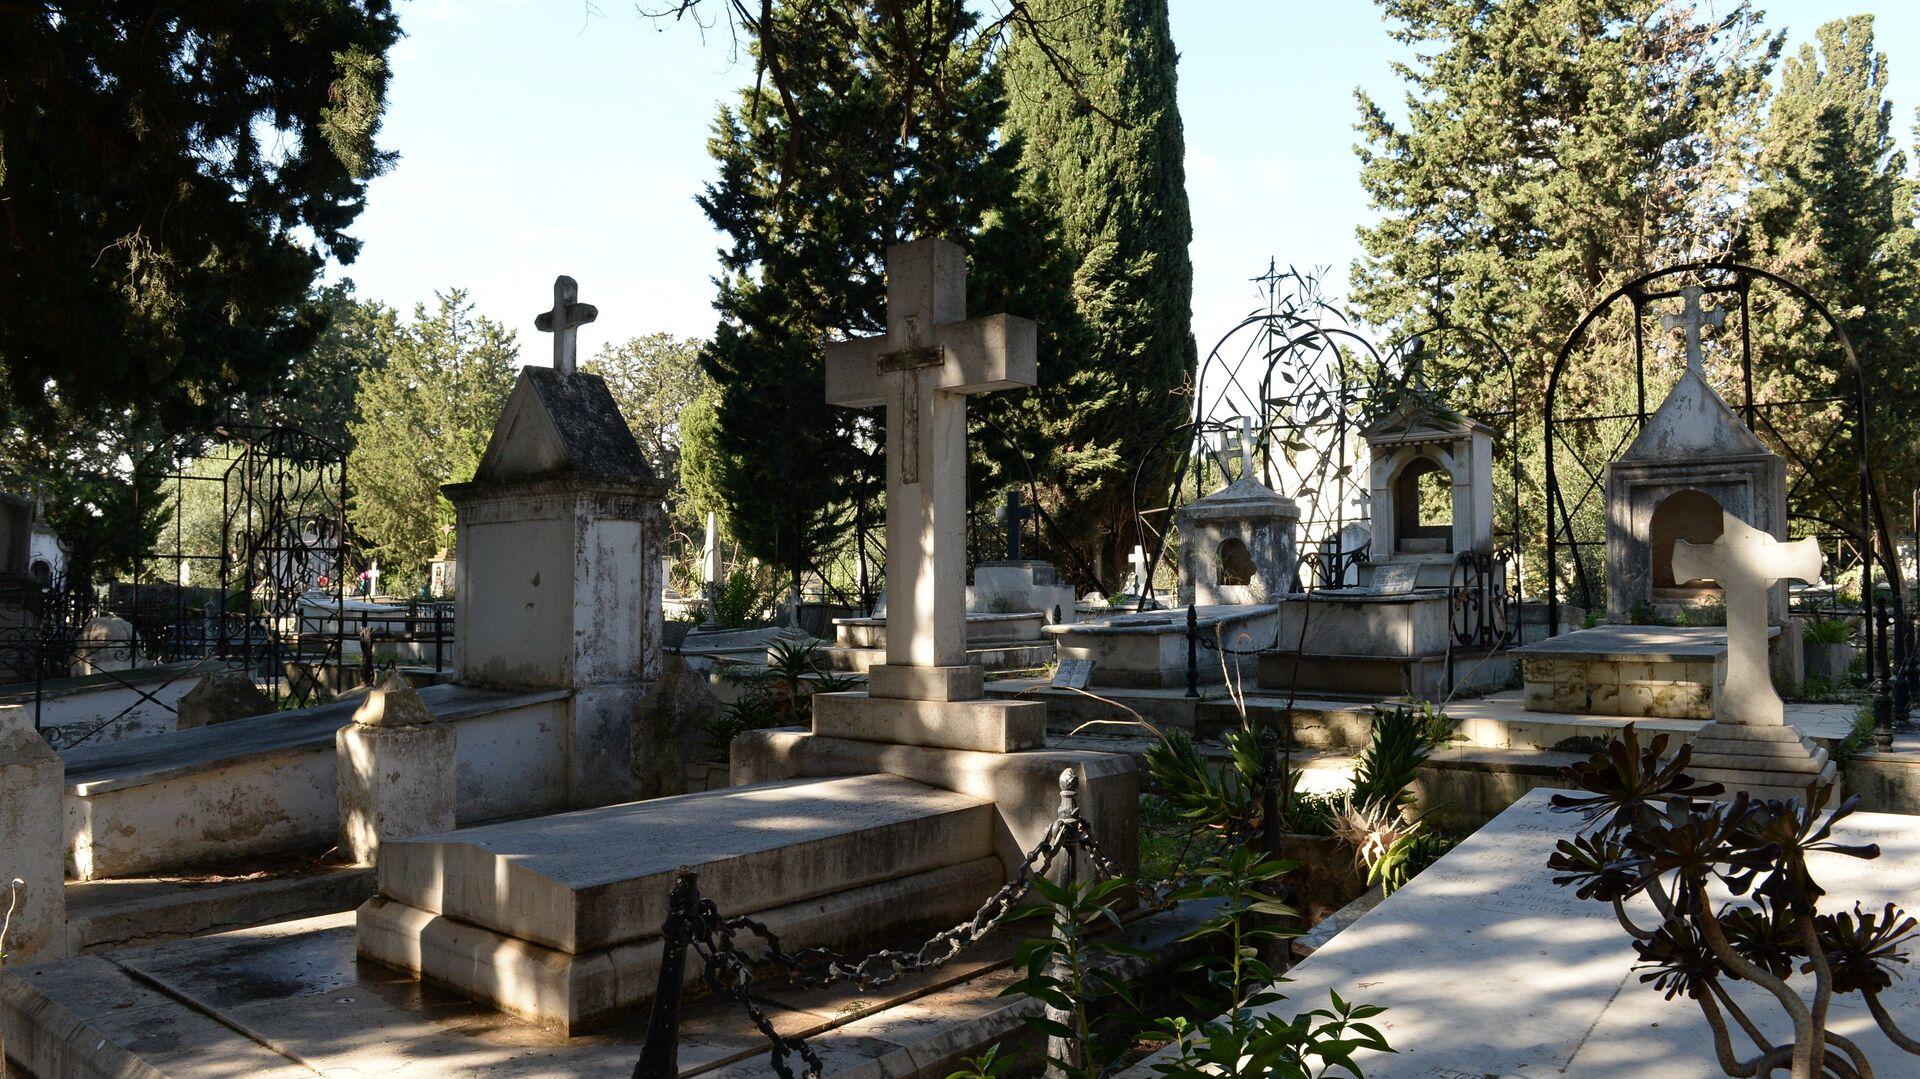 Cementerio - Sputnik Mundo, 1920, 15.04.2021